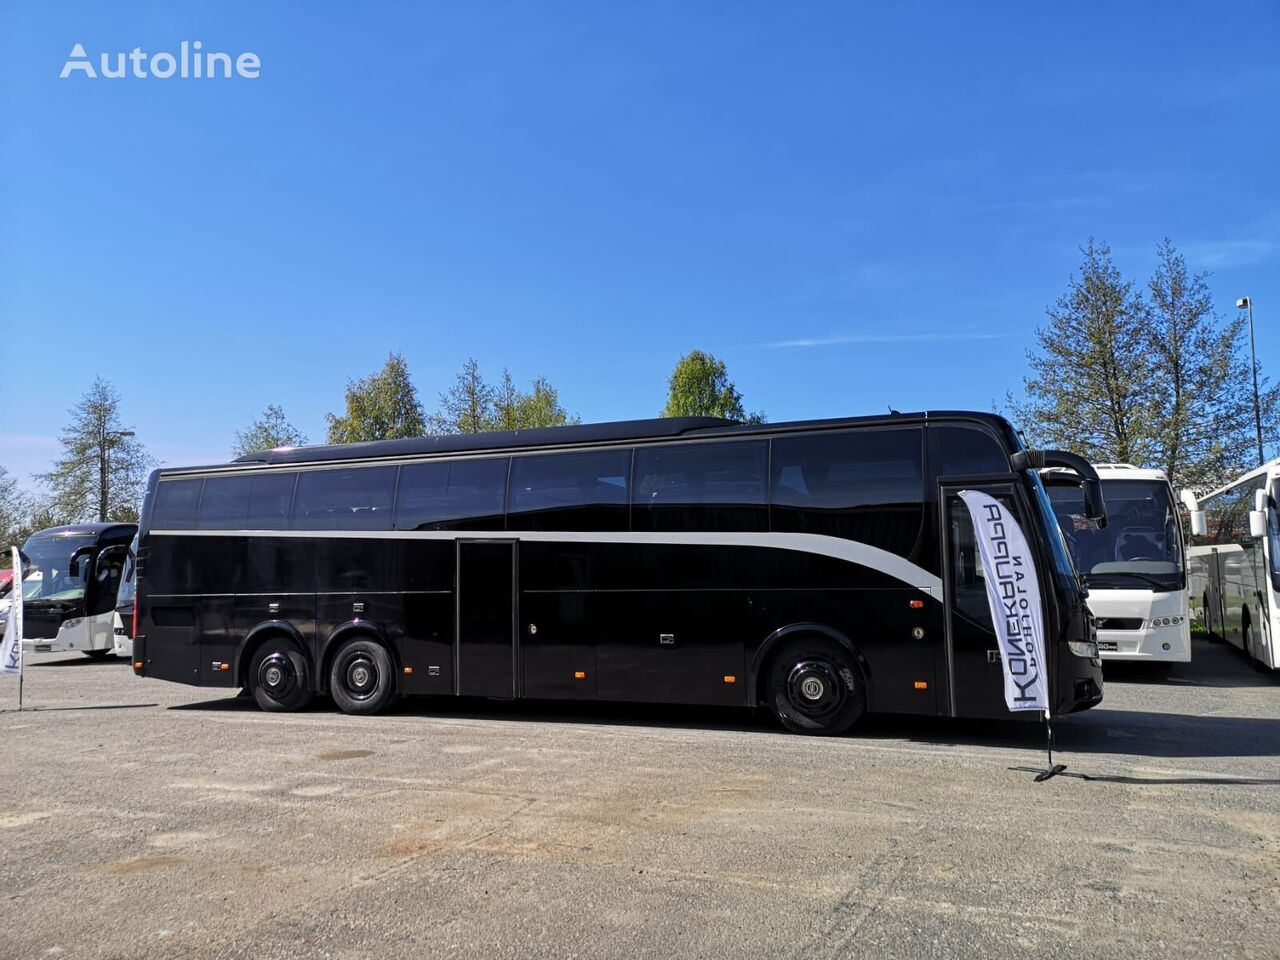 VOLVO 9700 9900 HD B12B coach bus